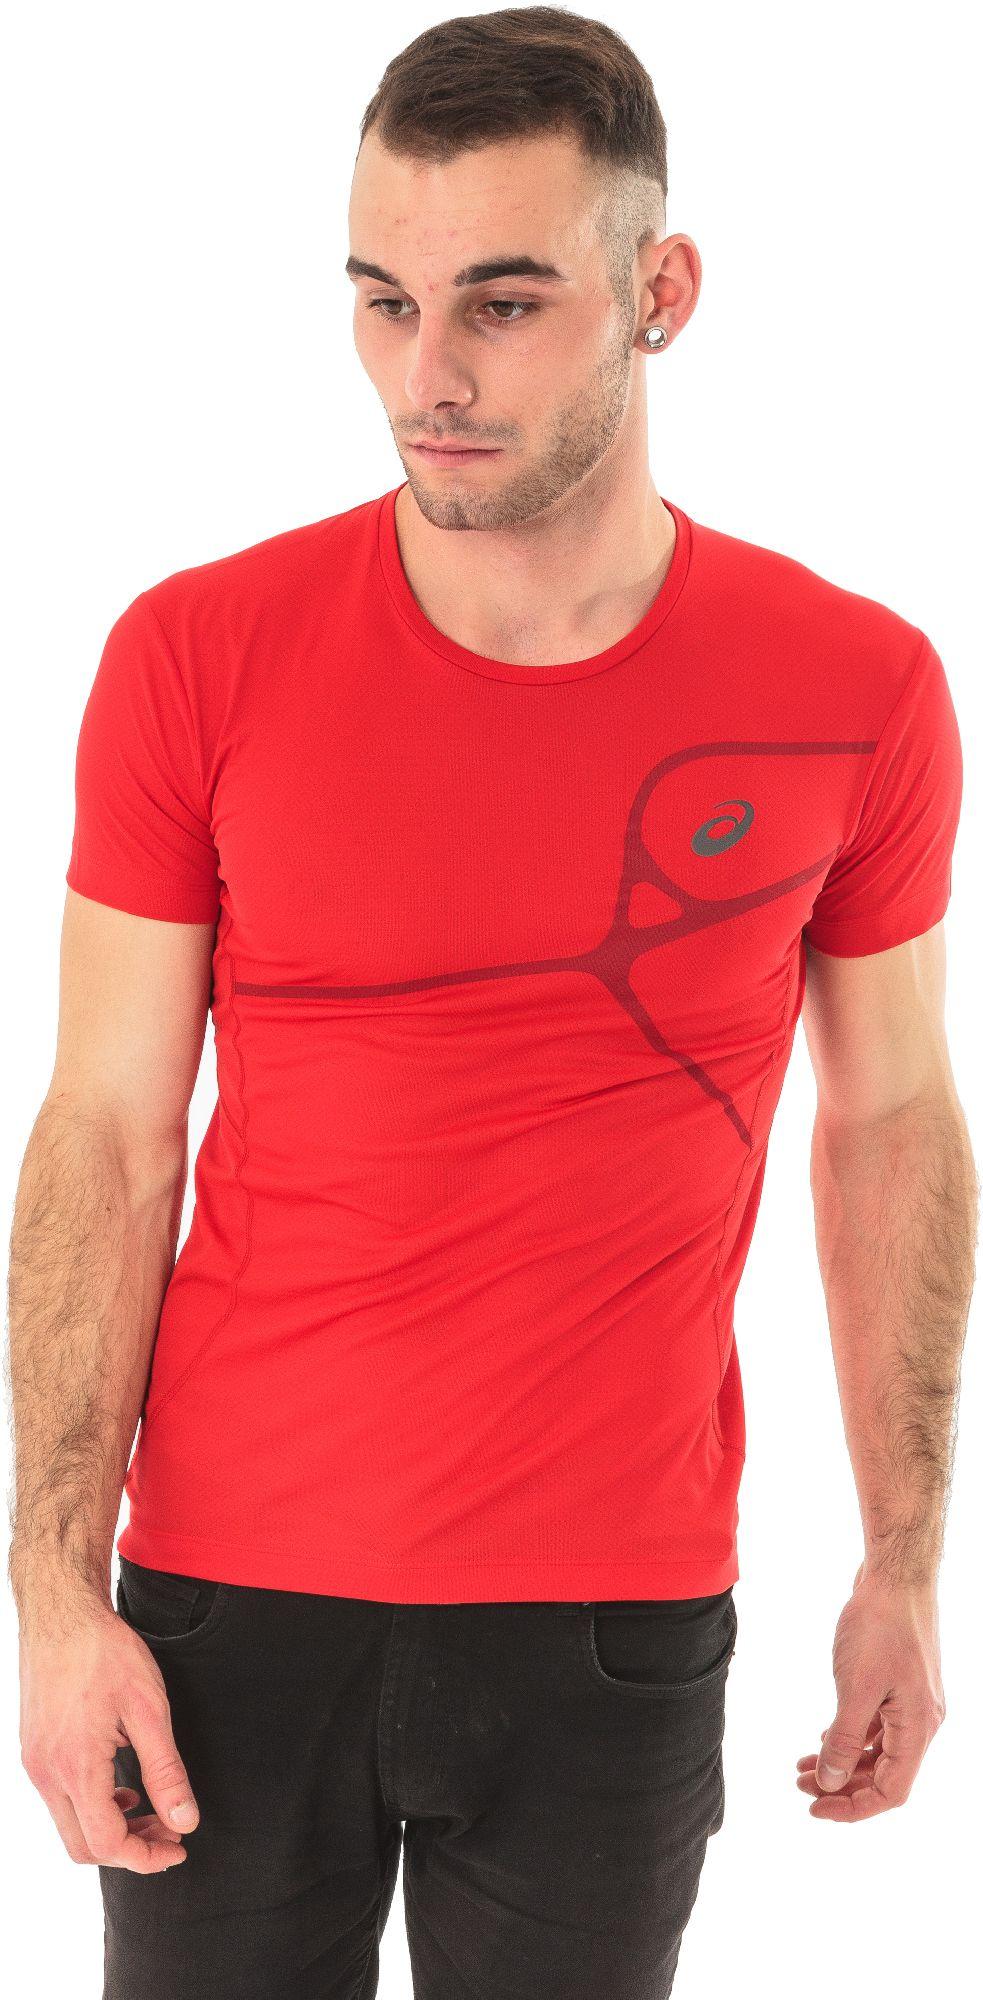 Asics Koszulka meska Protection Road Top czerwona r. L (1298636015) 1298636015